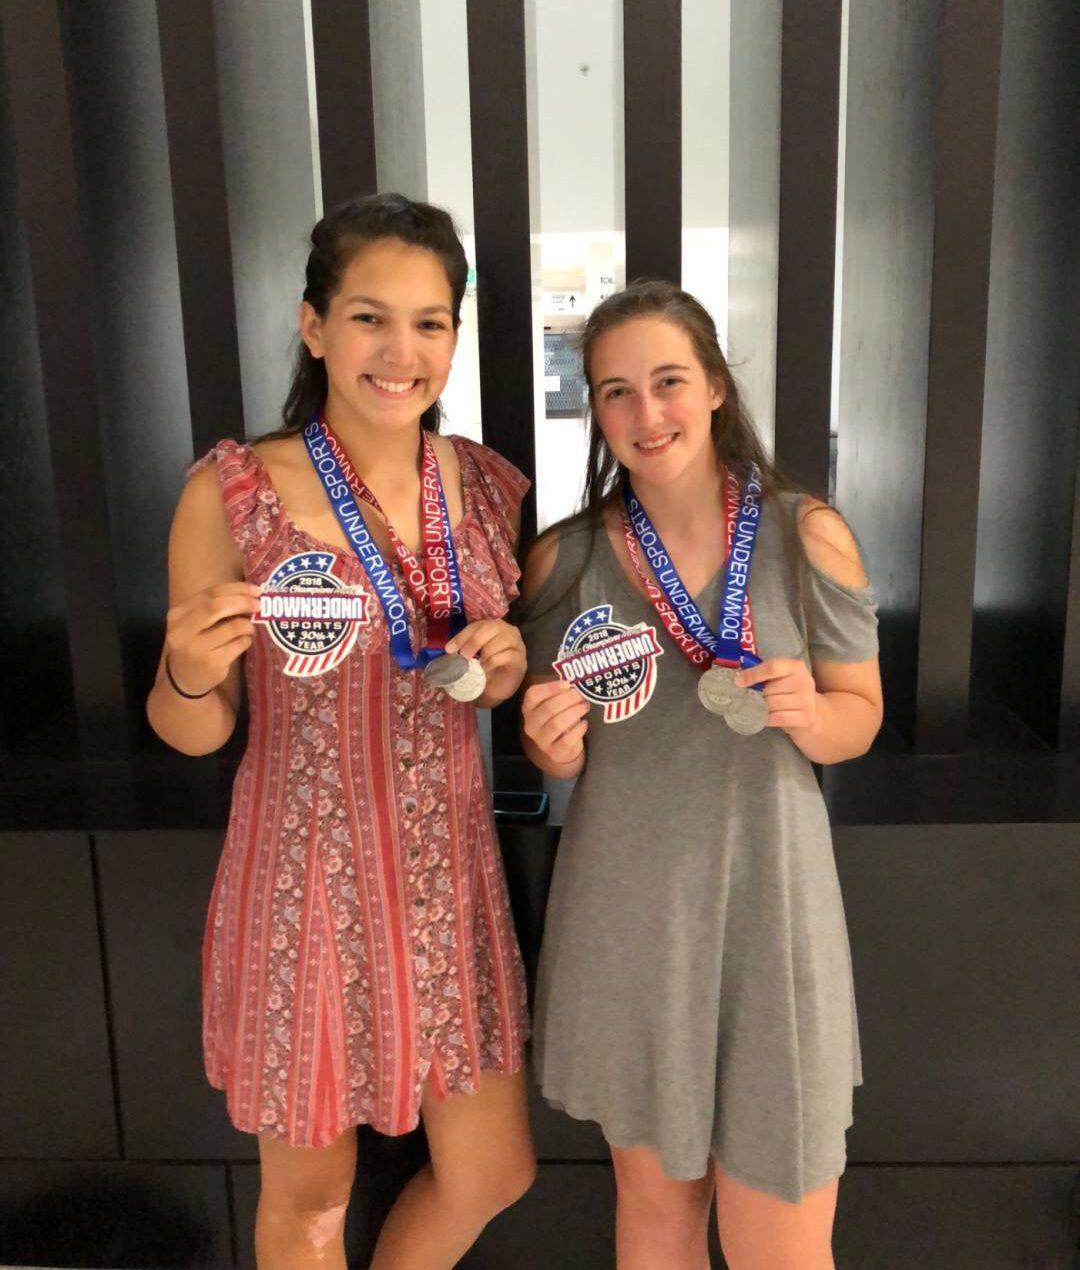 Vienne Sereseroz and Sam Bennett pose with their golf medals in Australia